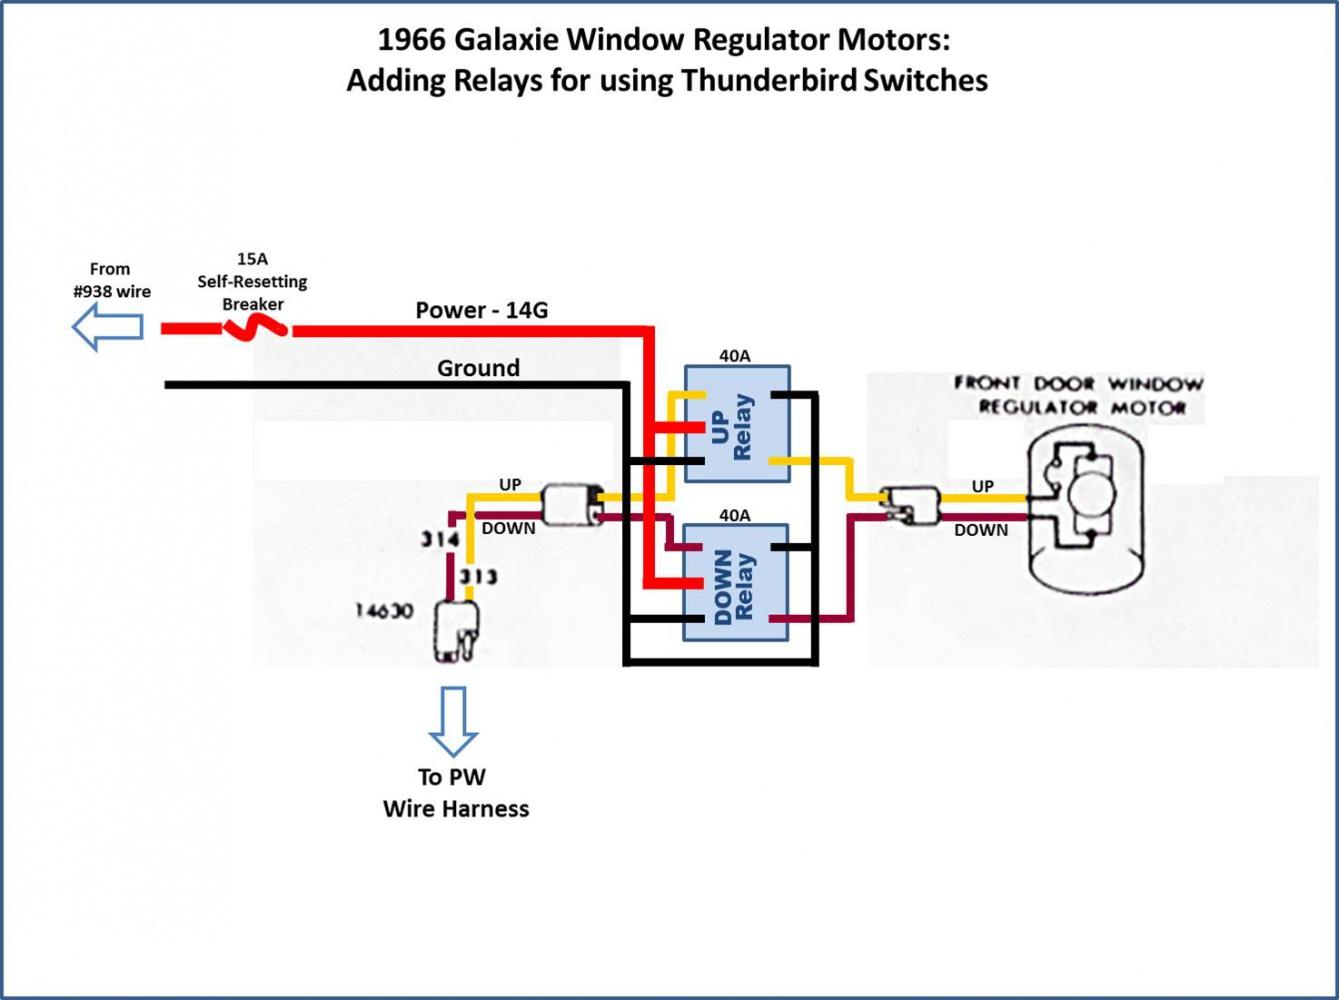 Electric Window Wiring Diagram Mazda 3 | Wiring Diagram - Power Window Switch Wiring Diagram